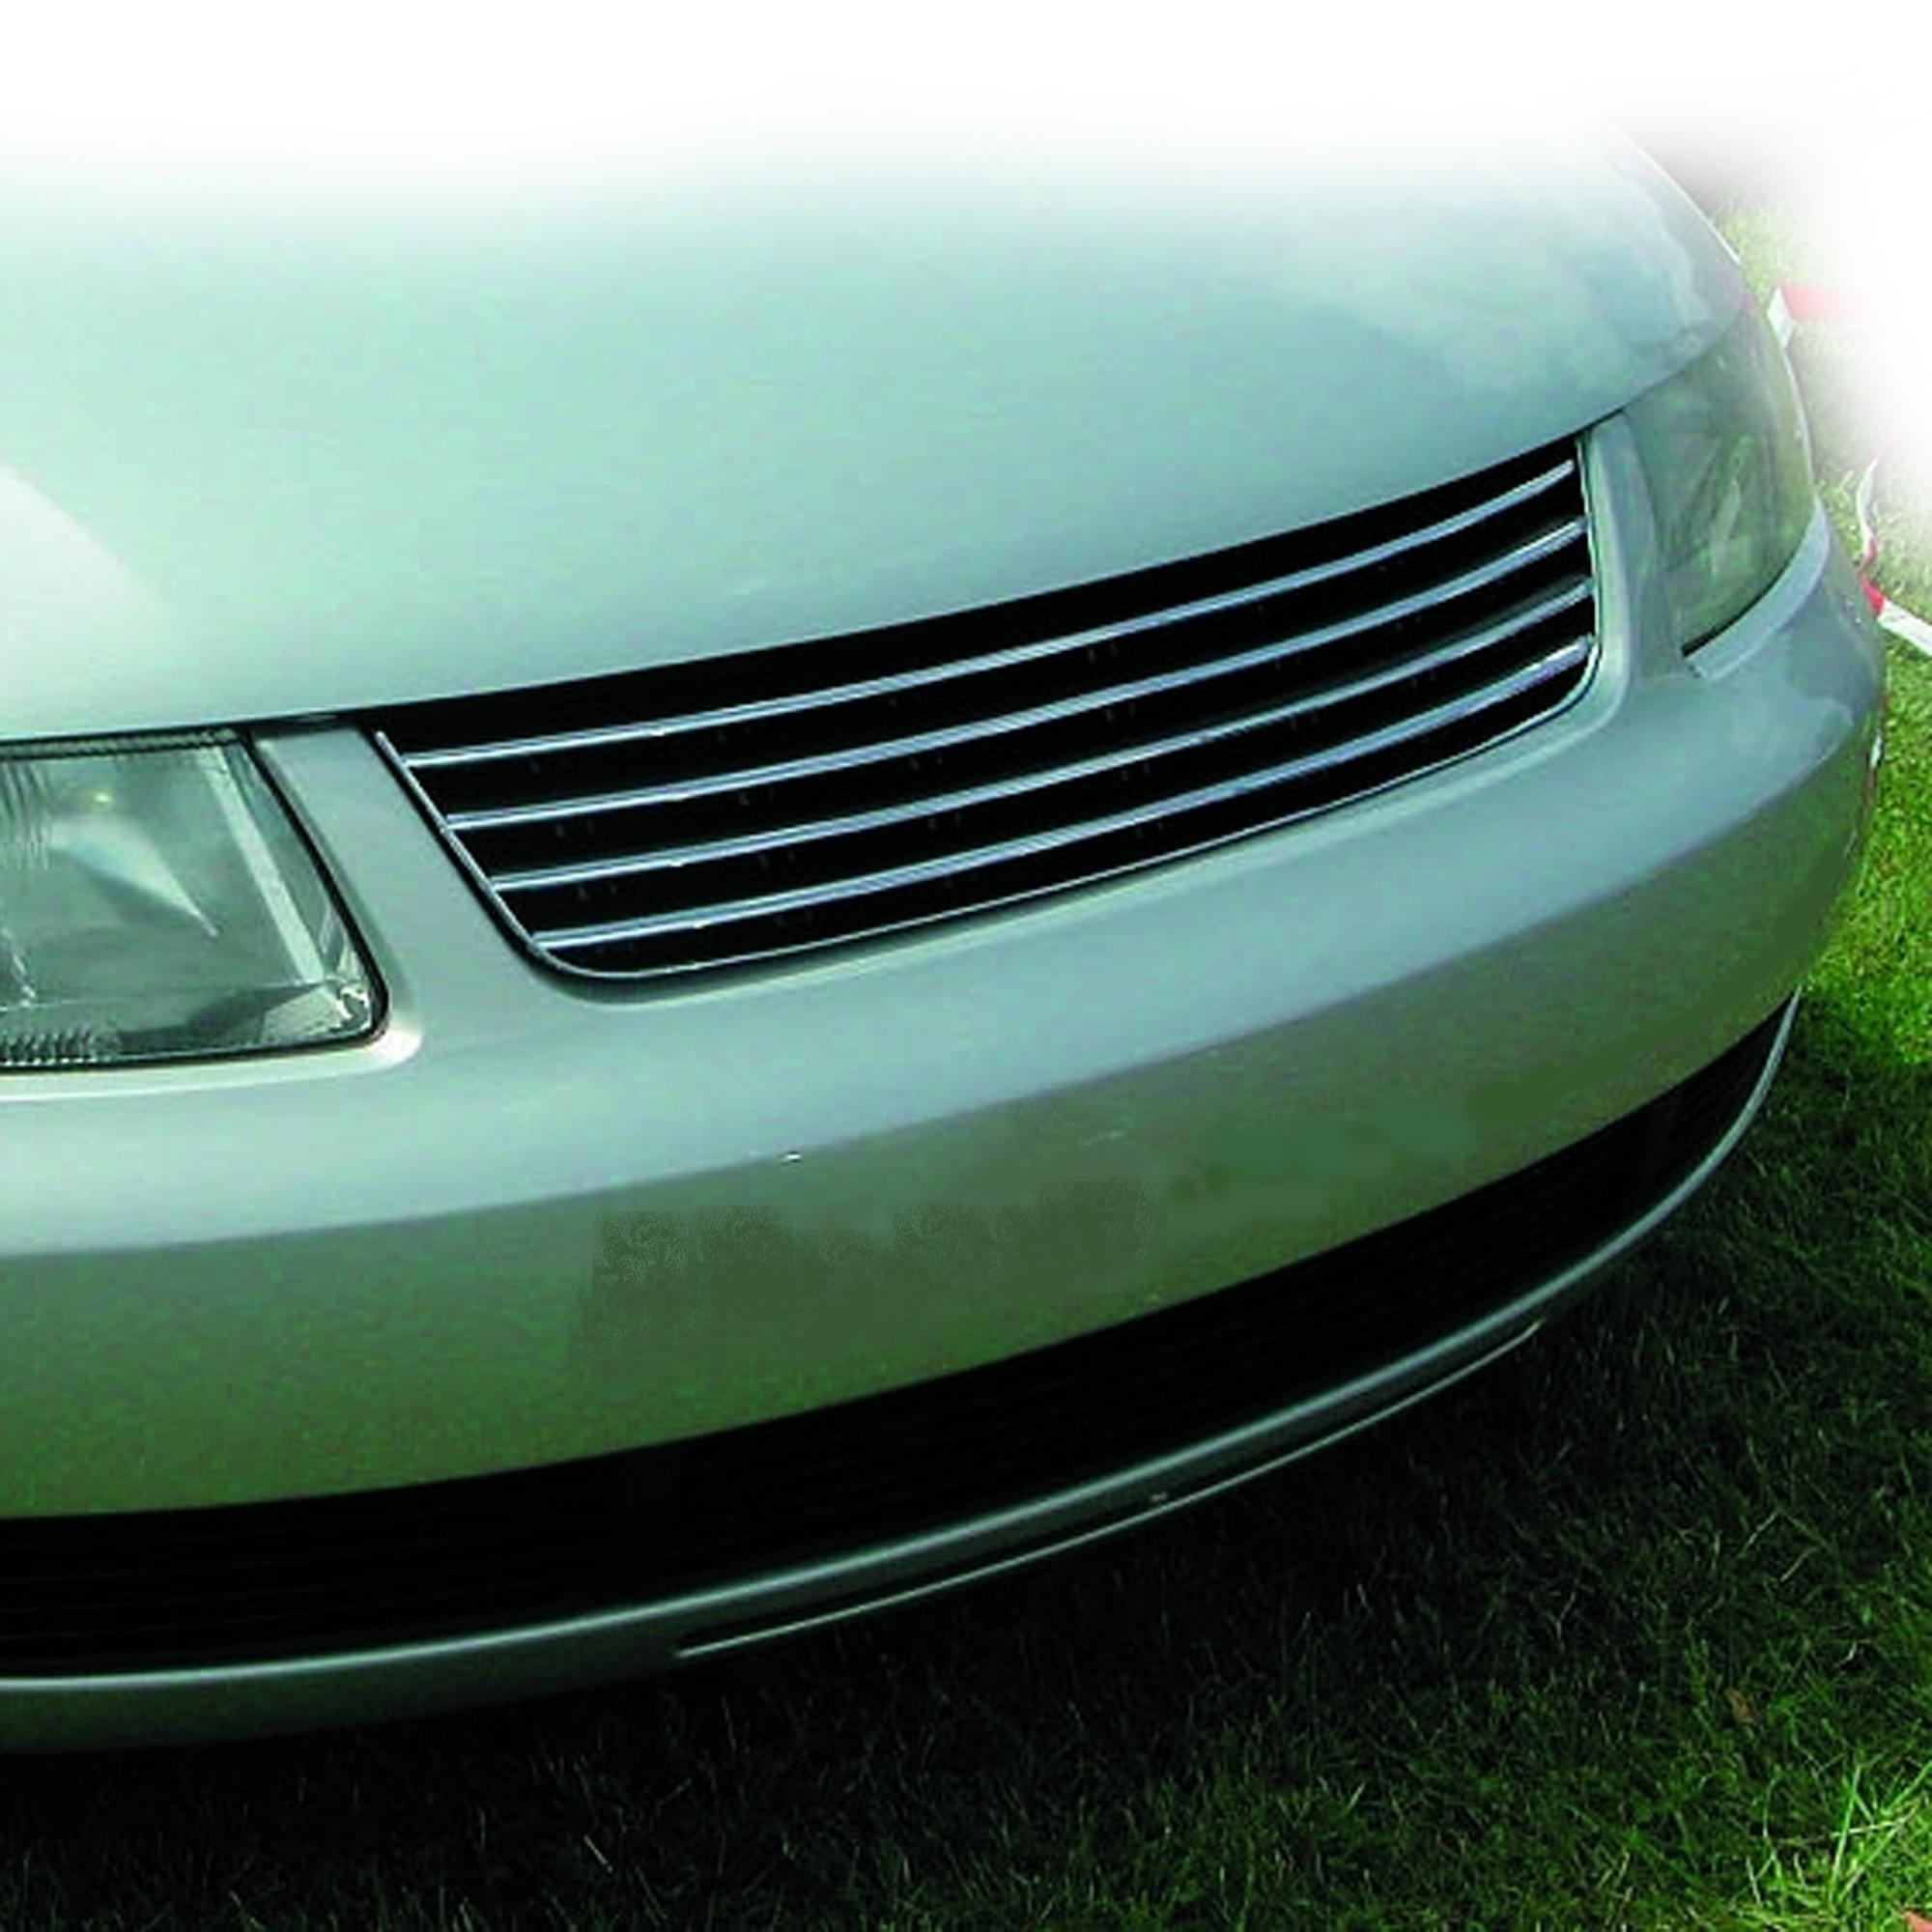 JOM Frontgrill sort/krom til VW Passat 3B årgang 1996-2000 - uden logo Styling